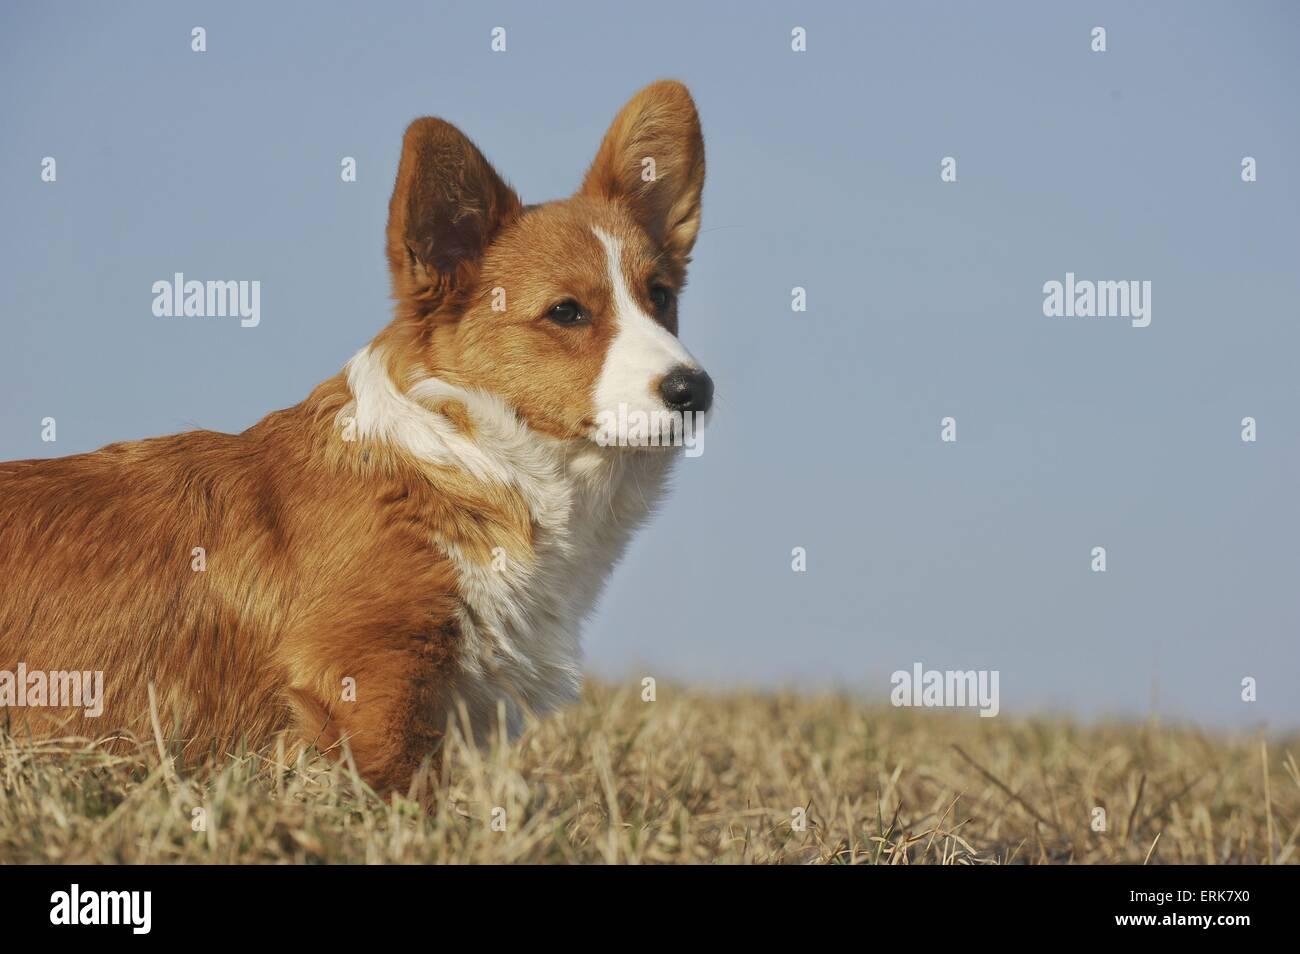 Welsh Corgi Cardigan Puppy - Stock Image